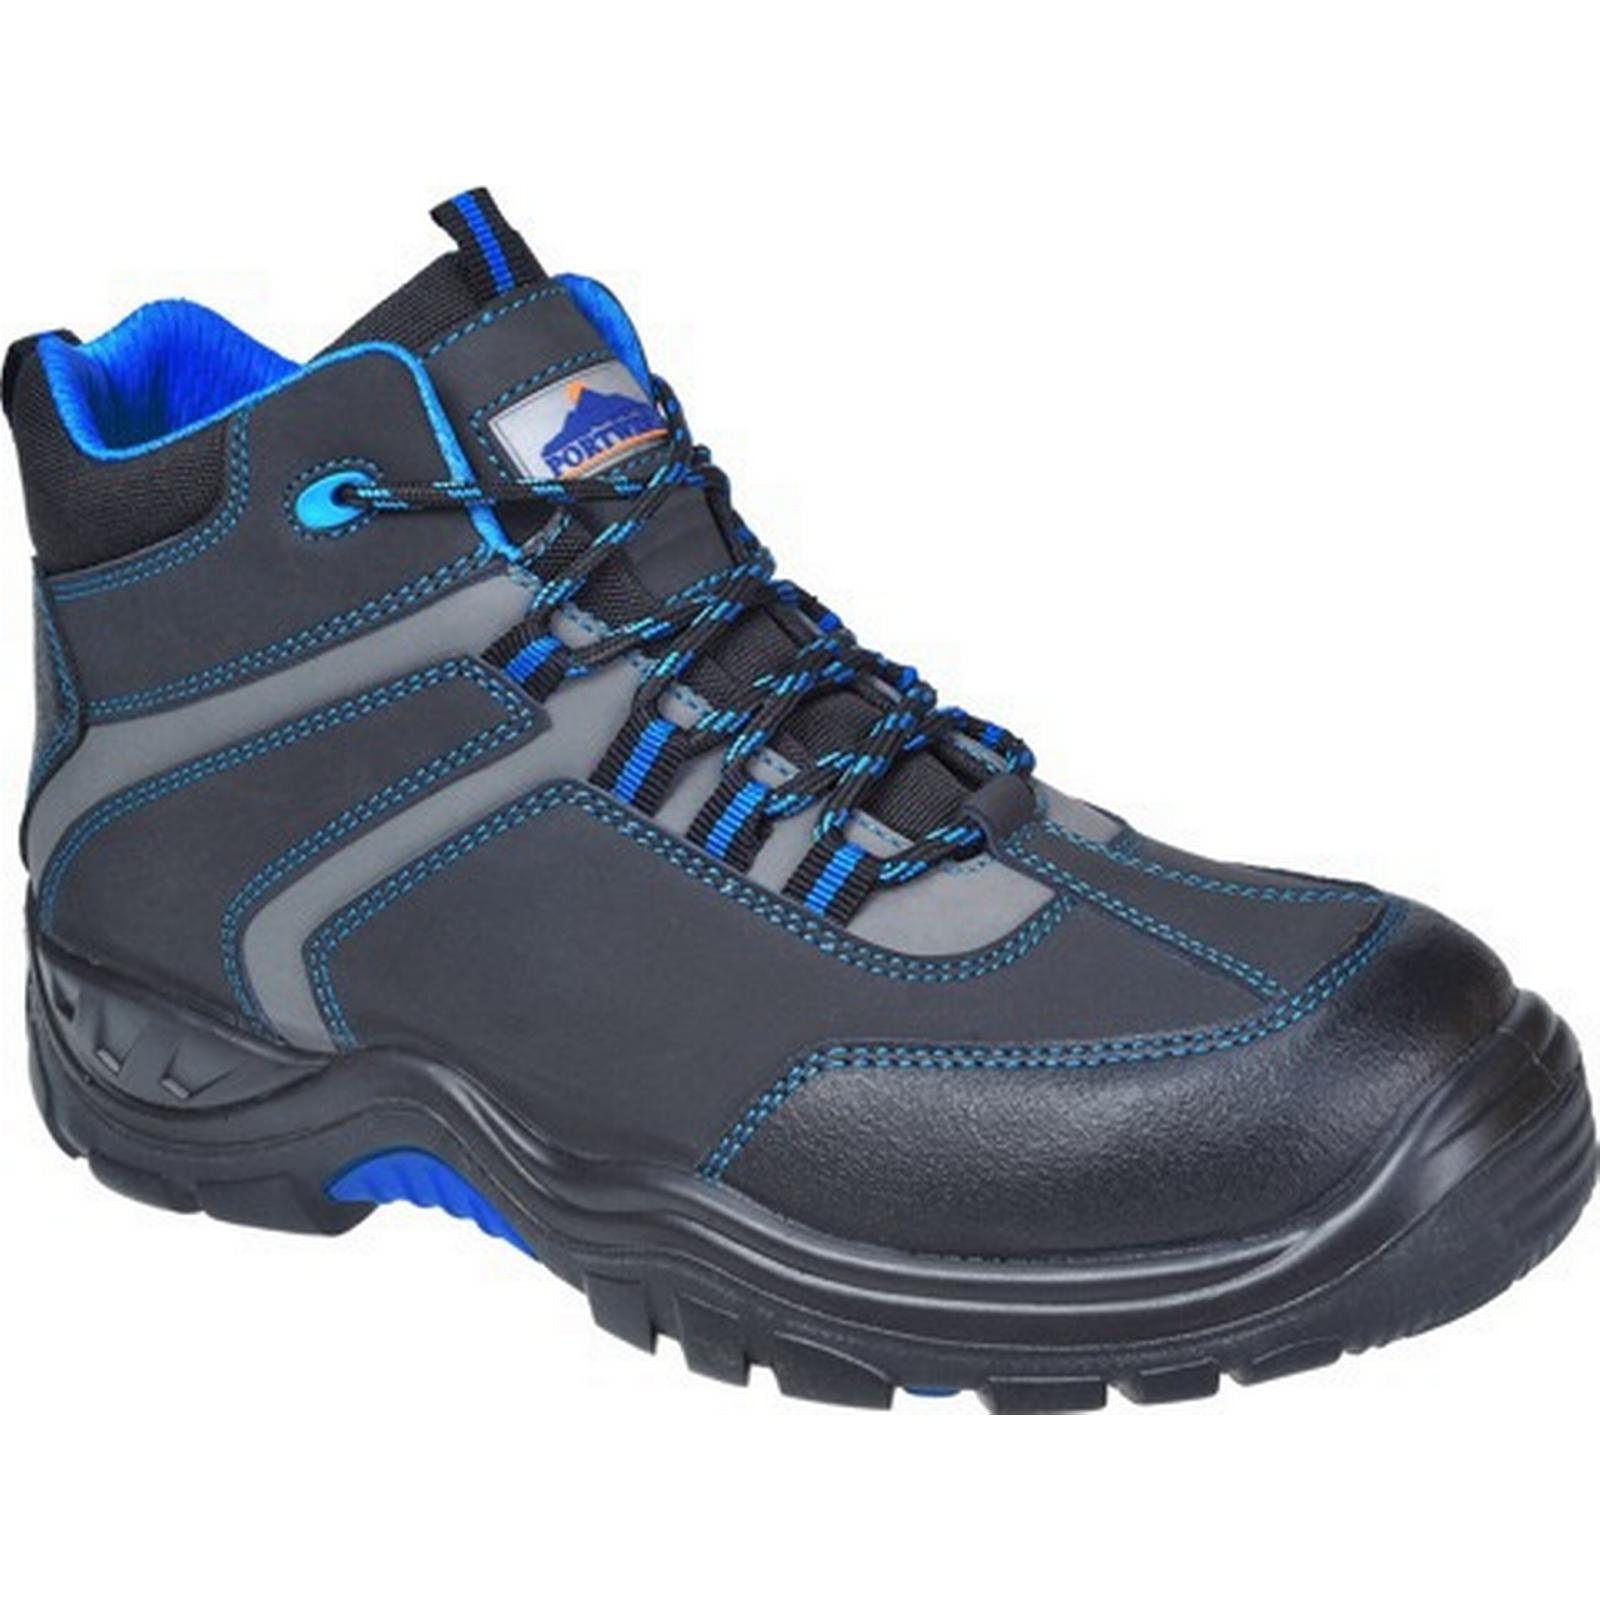 Compositelite Operis Boot S3 Hro Blue / 10 10 / 195078